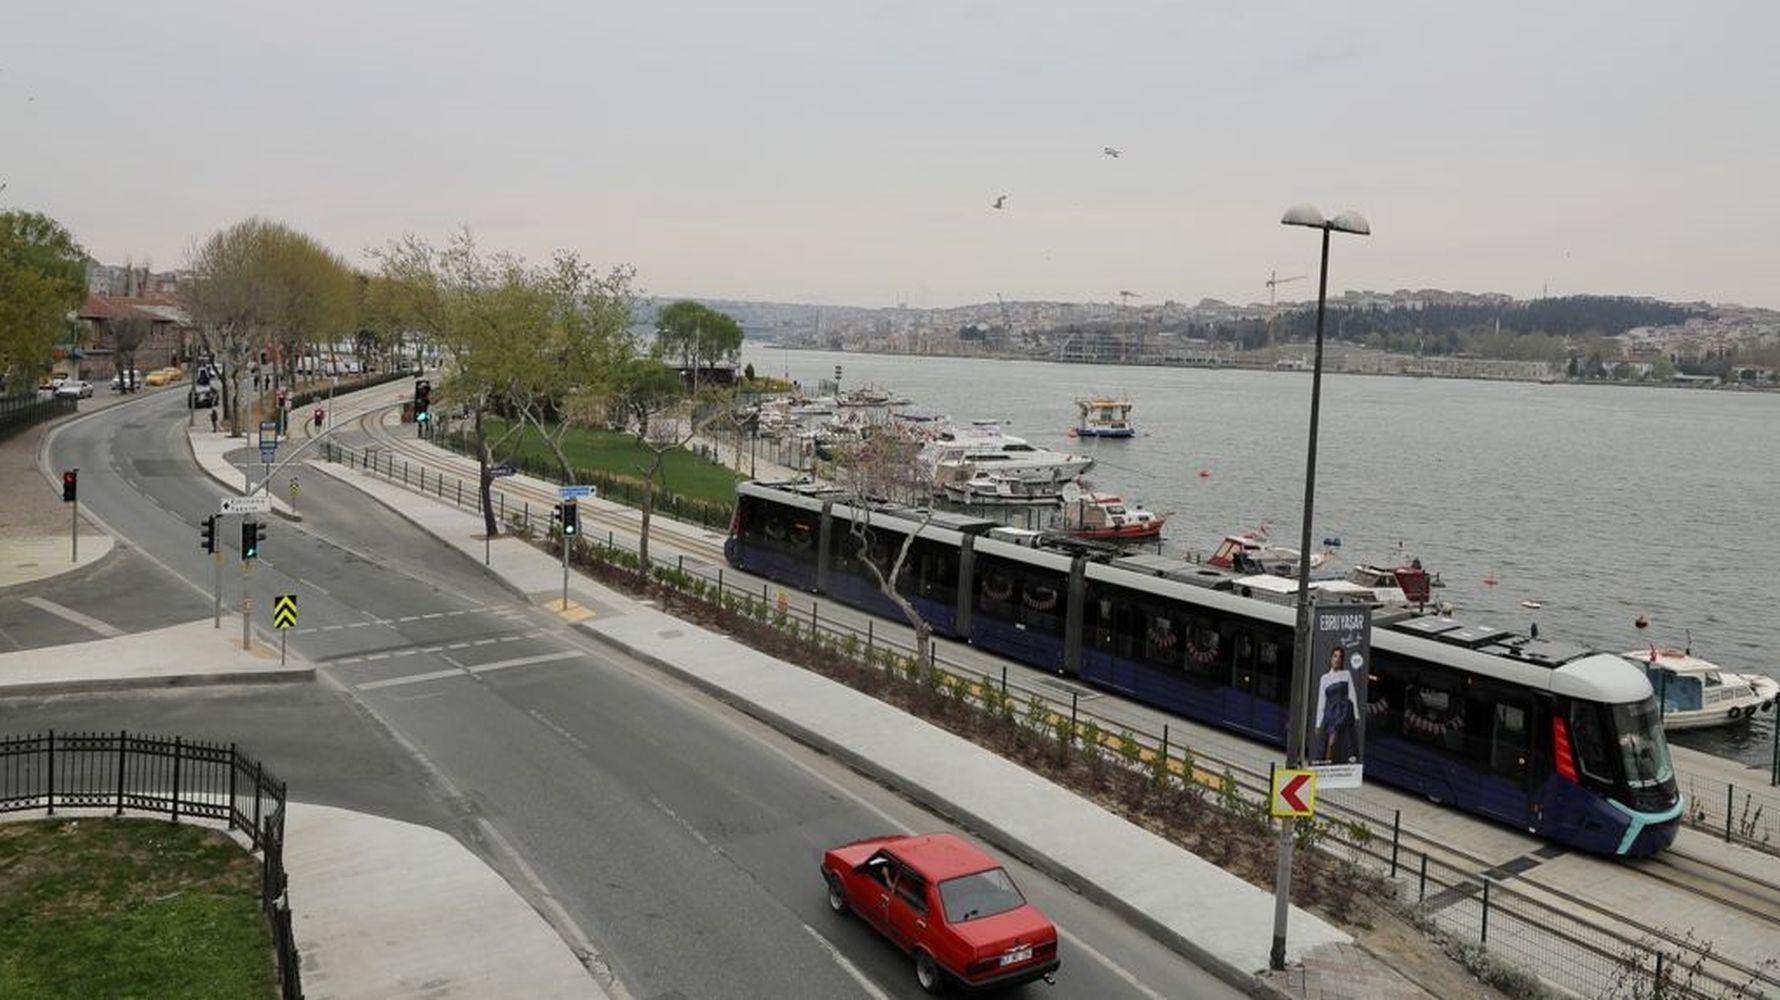 Eminonu alibeykoy tram line will also be finished